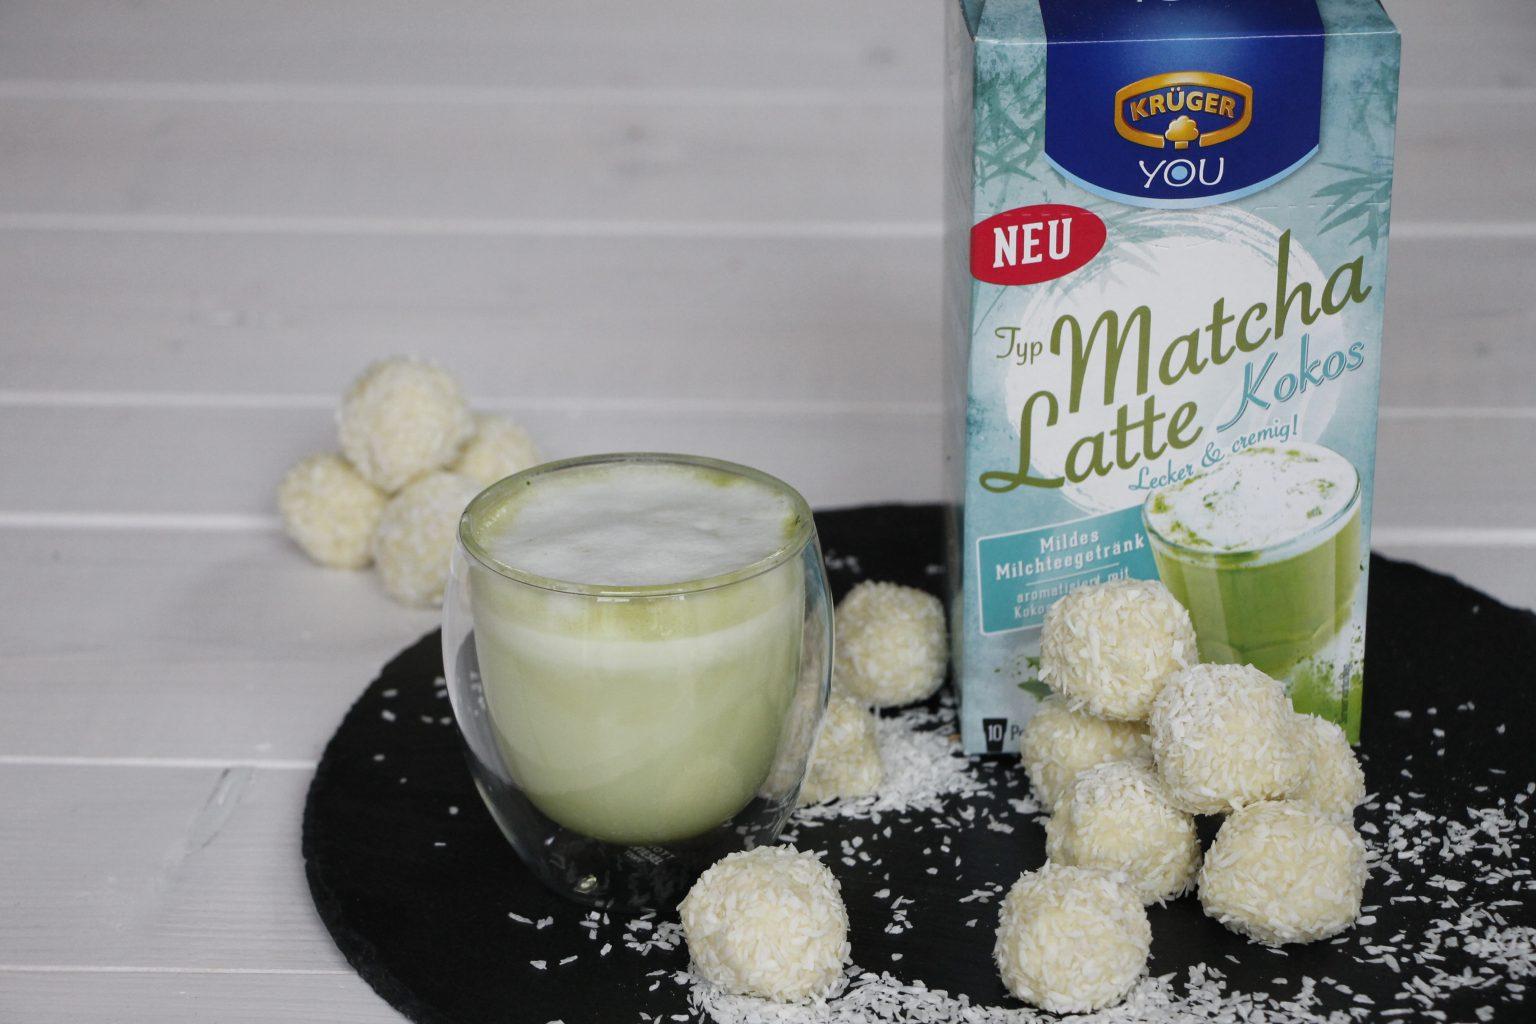 Matcha Latte Kokos Krüger